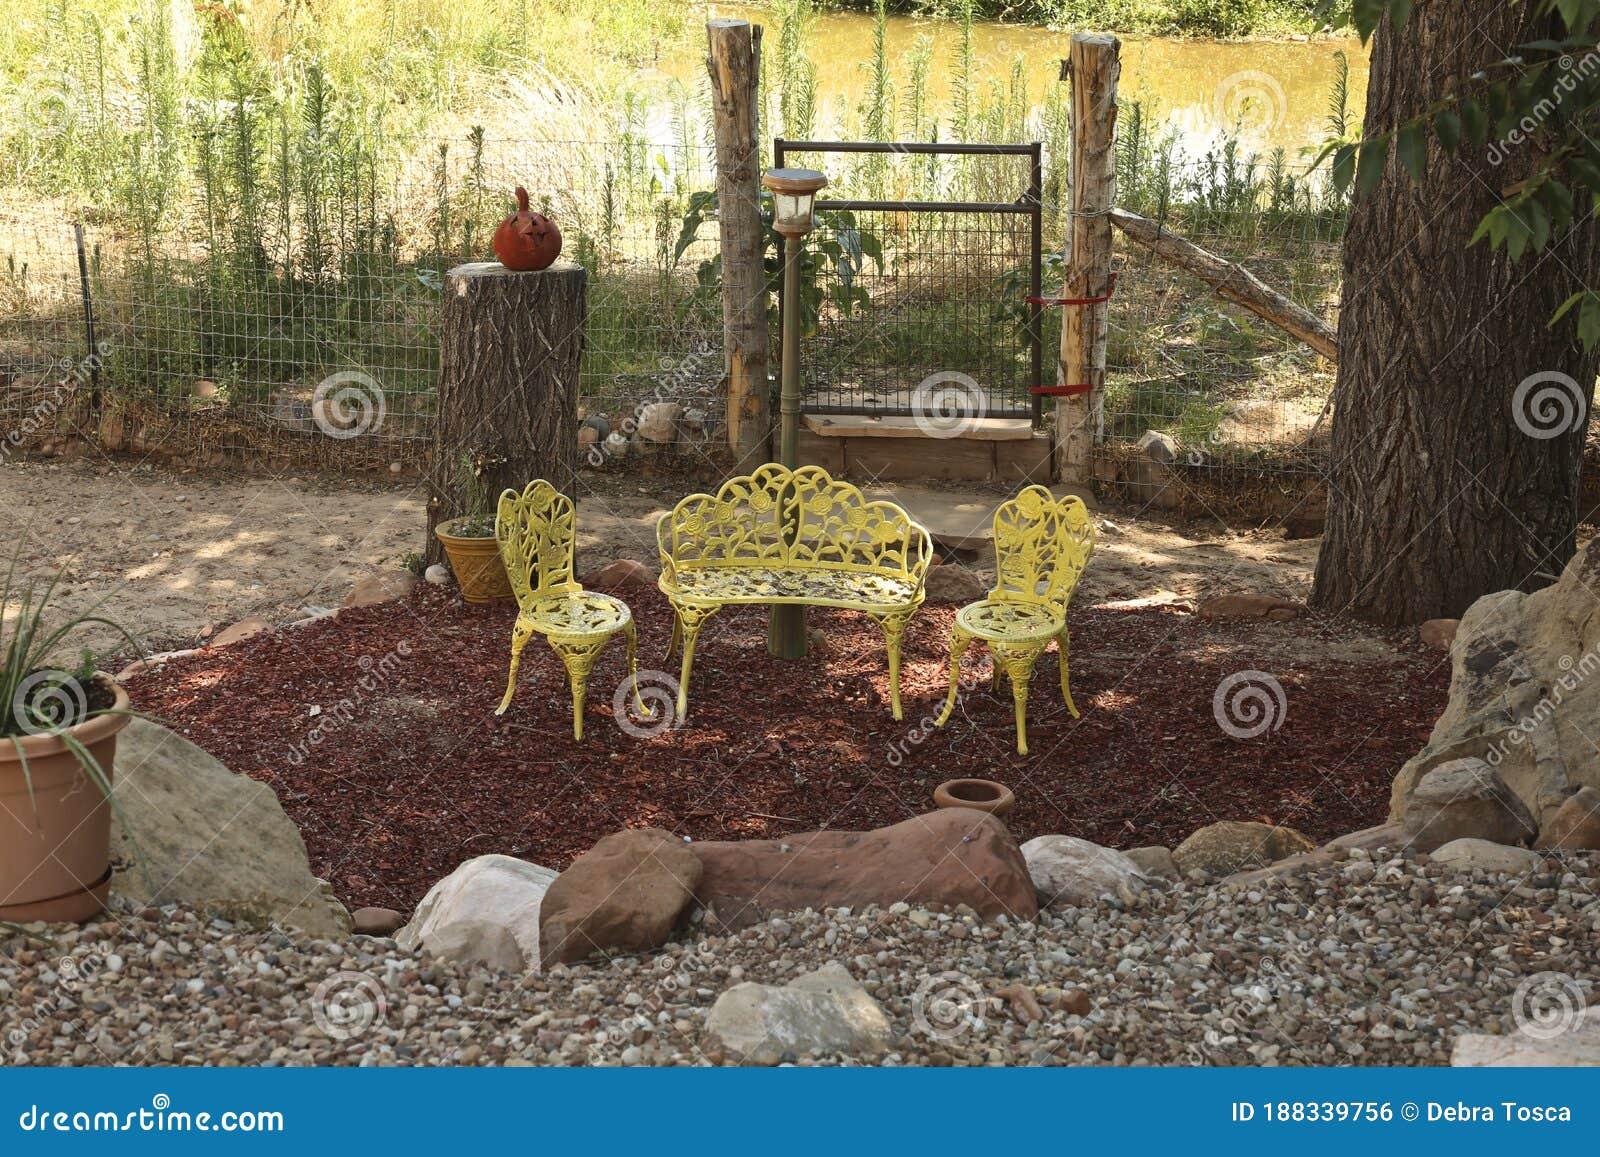 Garden Oasis Patio Furniture Nature Sanctuary Stock Photo Image Of Oasis Furniture 188339756